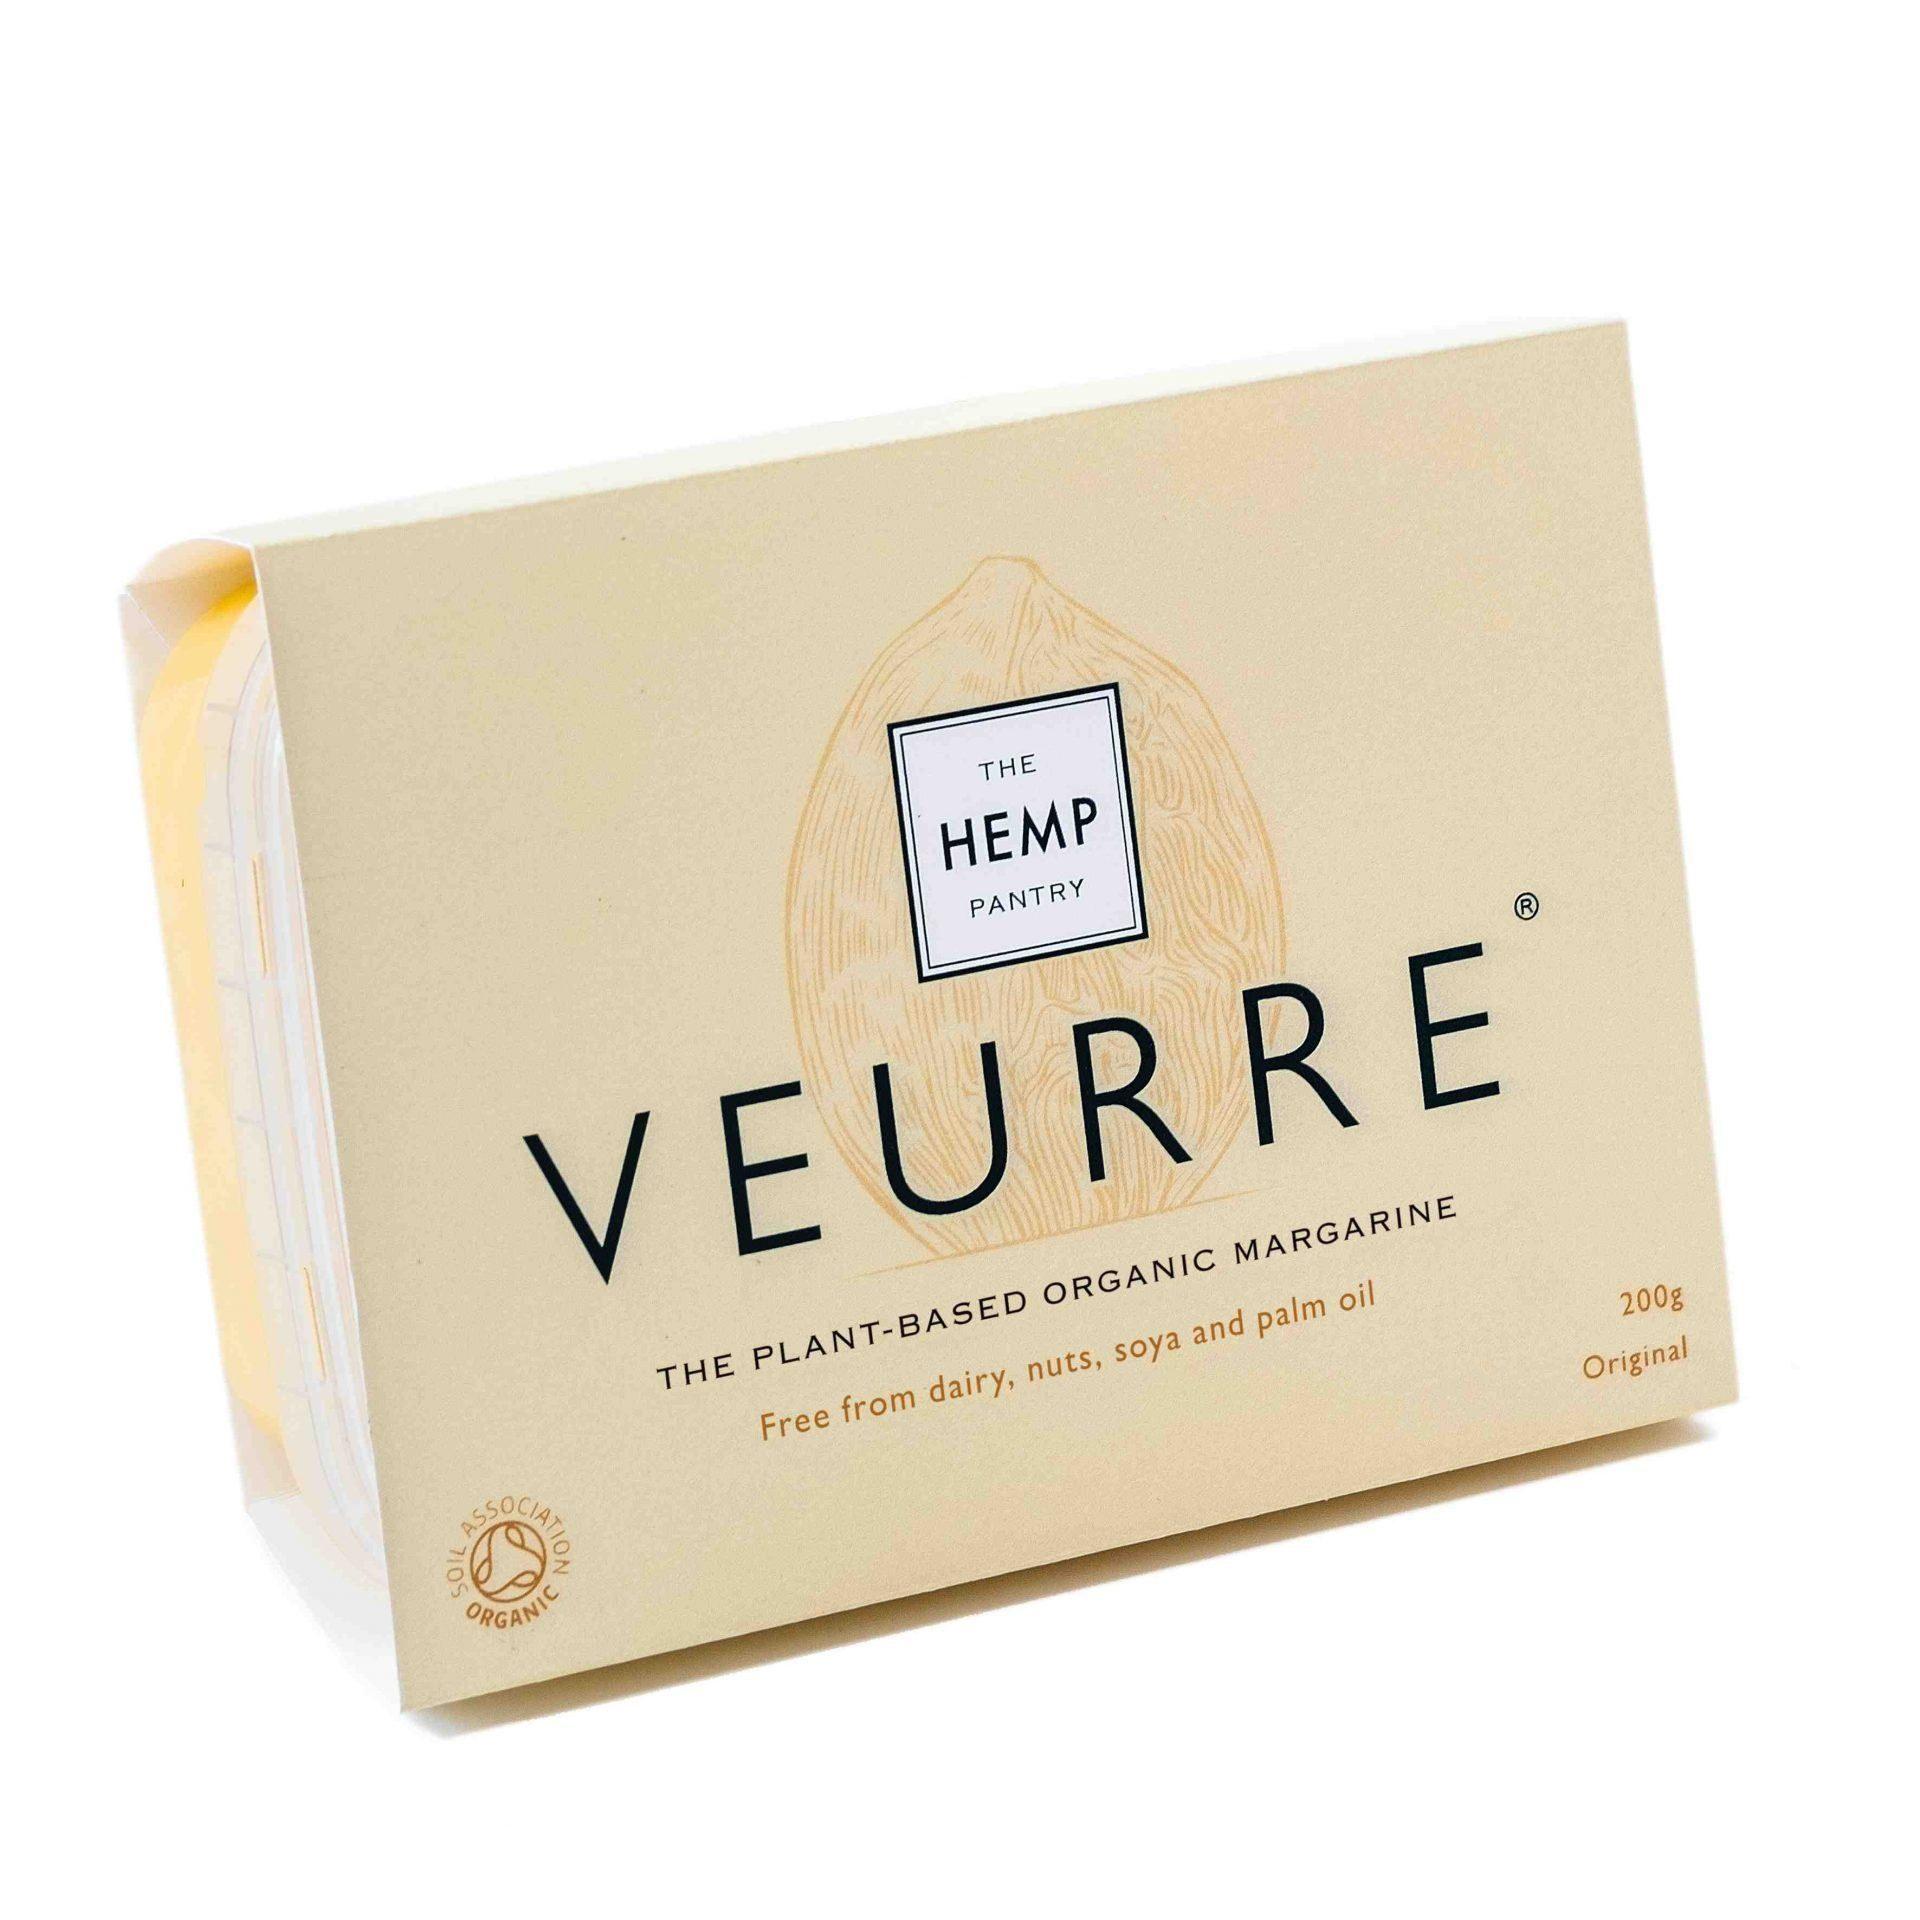 TheHempPantry-Veurre Packshot 1